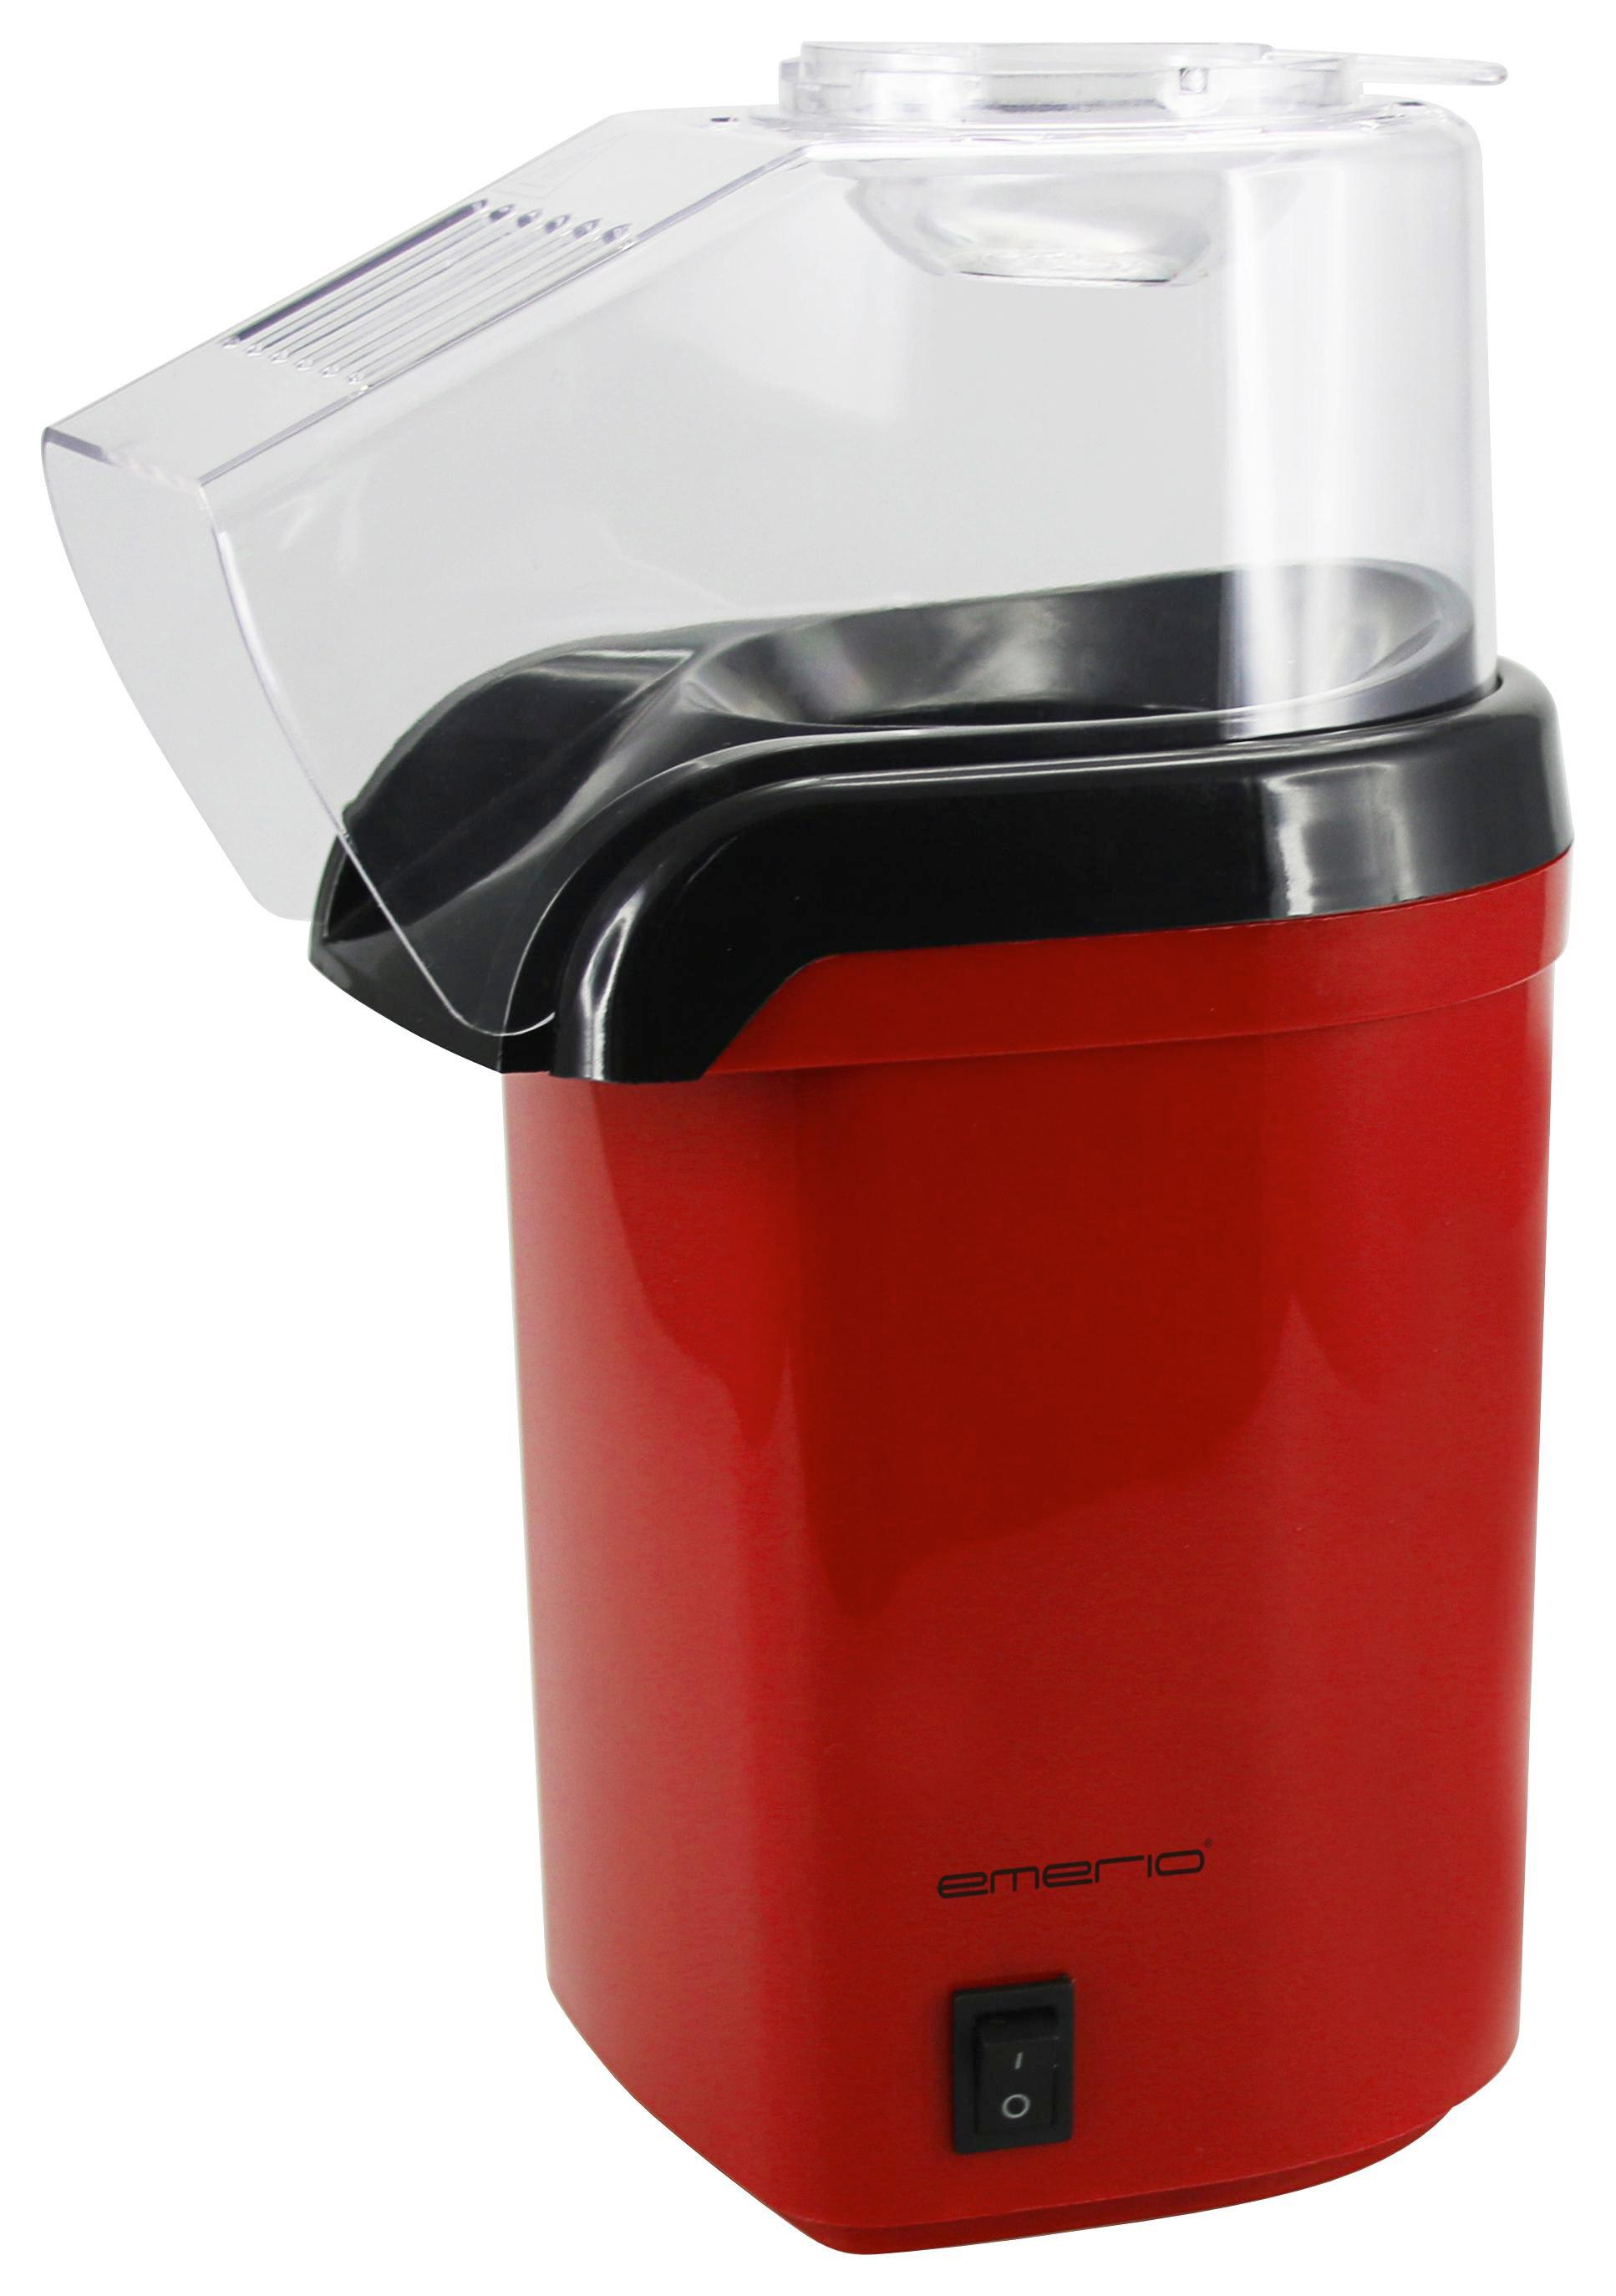 Popcornmaschine Jan, Max. 1200 Watt - Rot/Schwarz, Kunststoff (13/27,5/19cm)